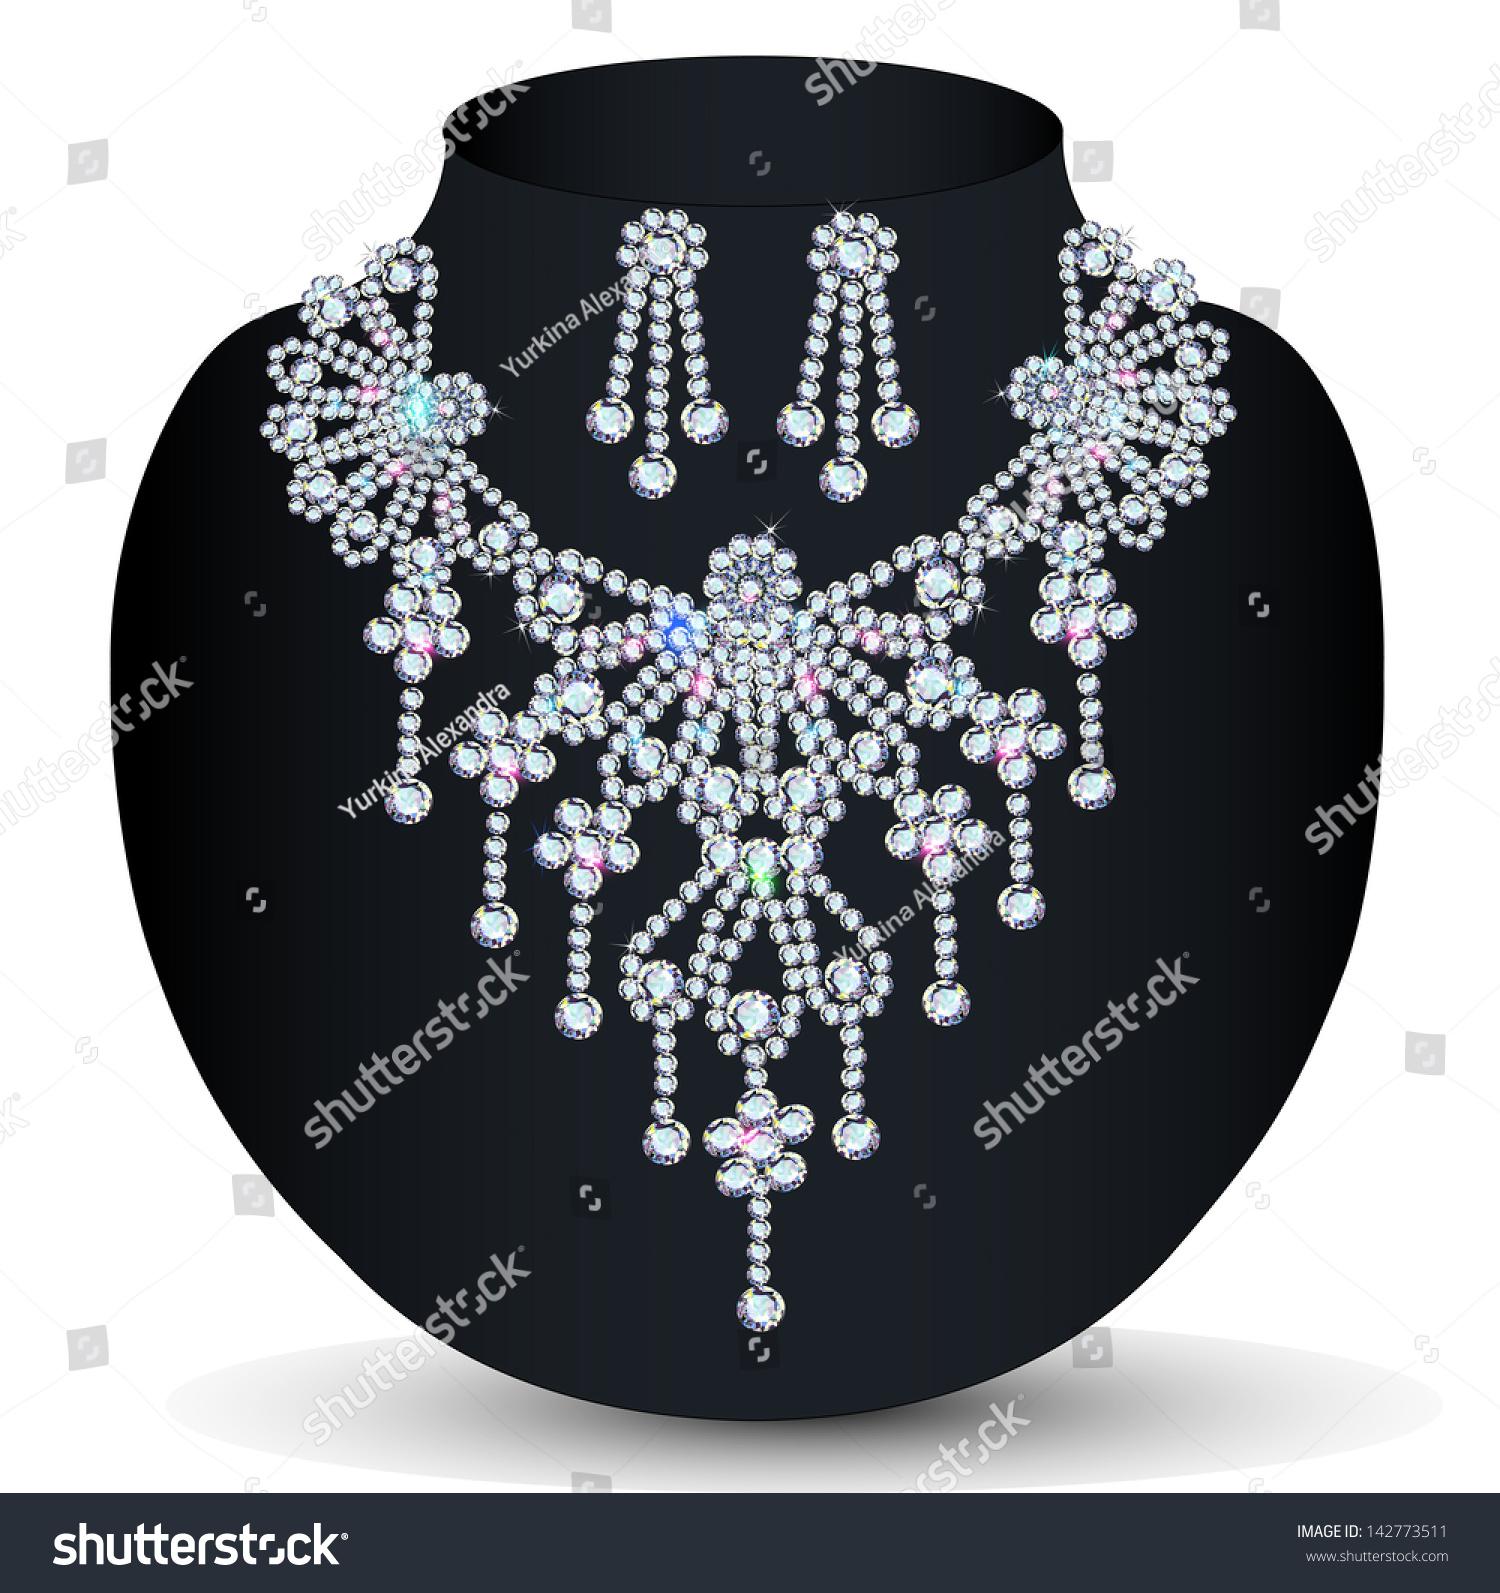 Precious Stones as Accessories for the Bride